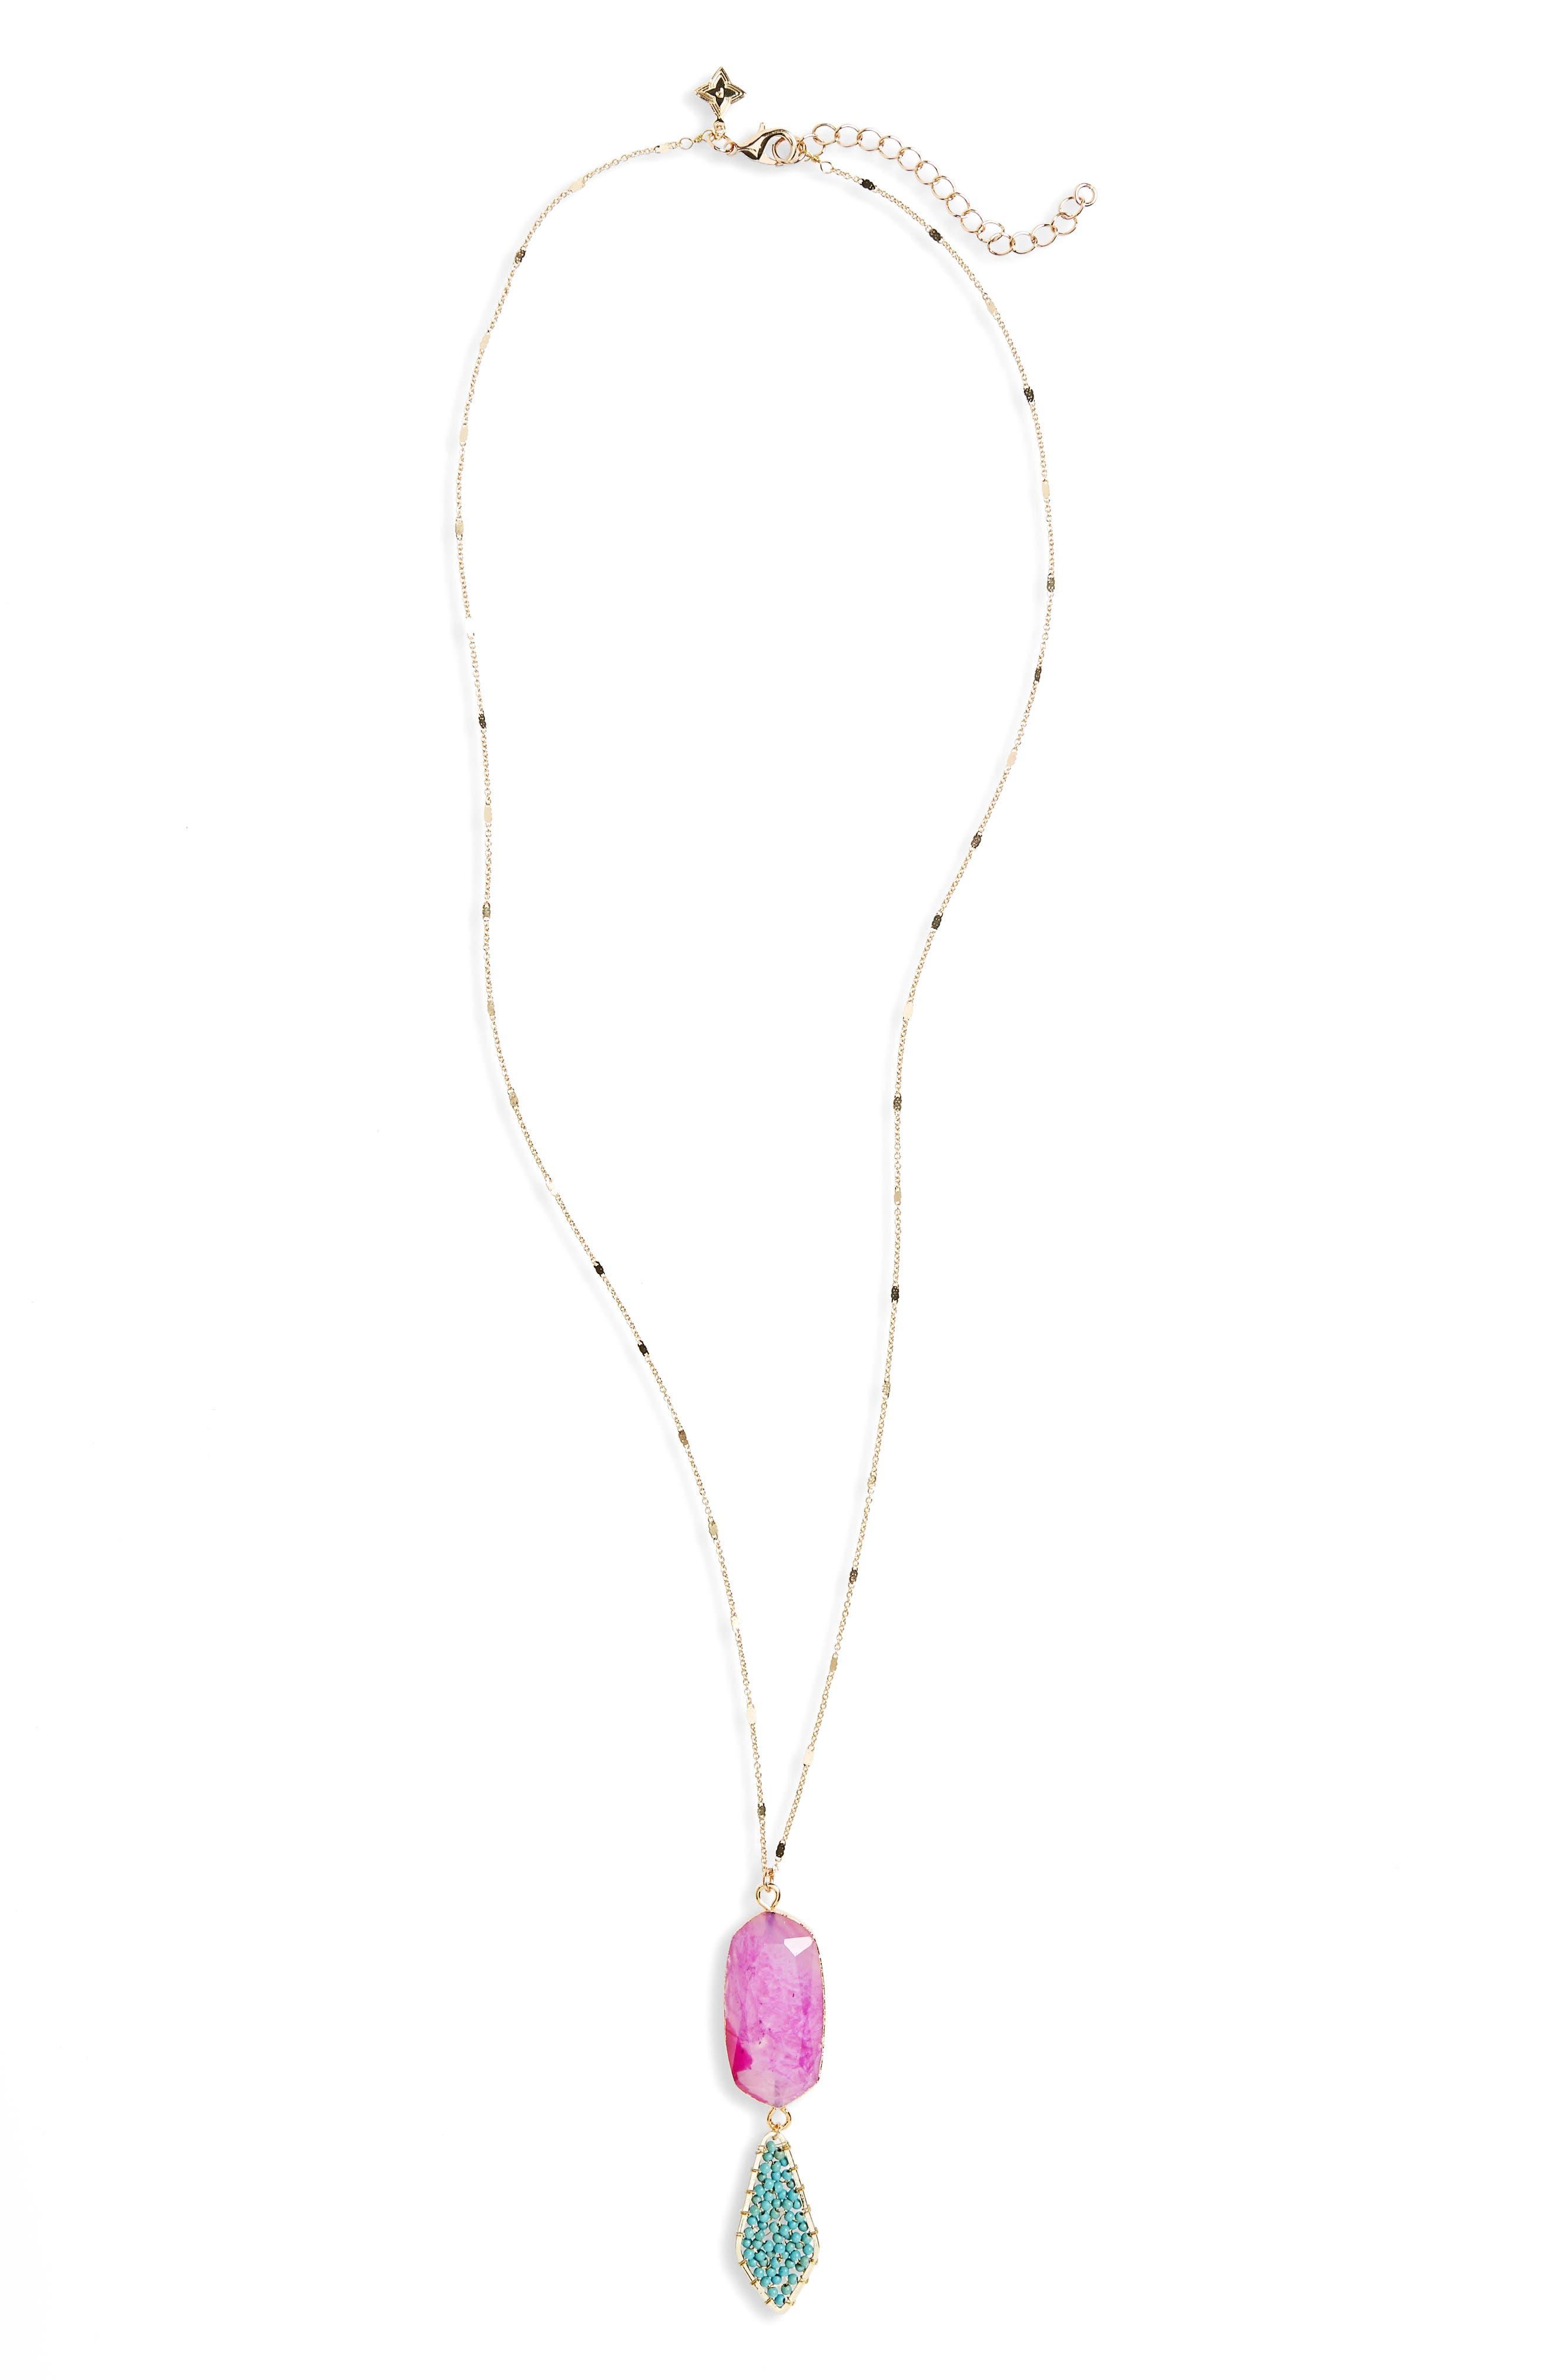 Howlite Stone Pendant Necklace,                         Main,                         color, Multi